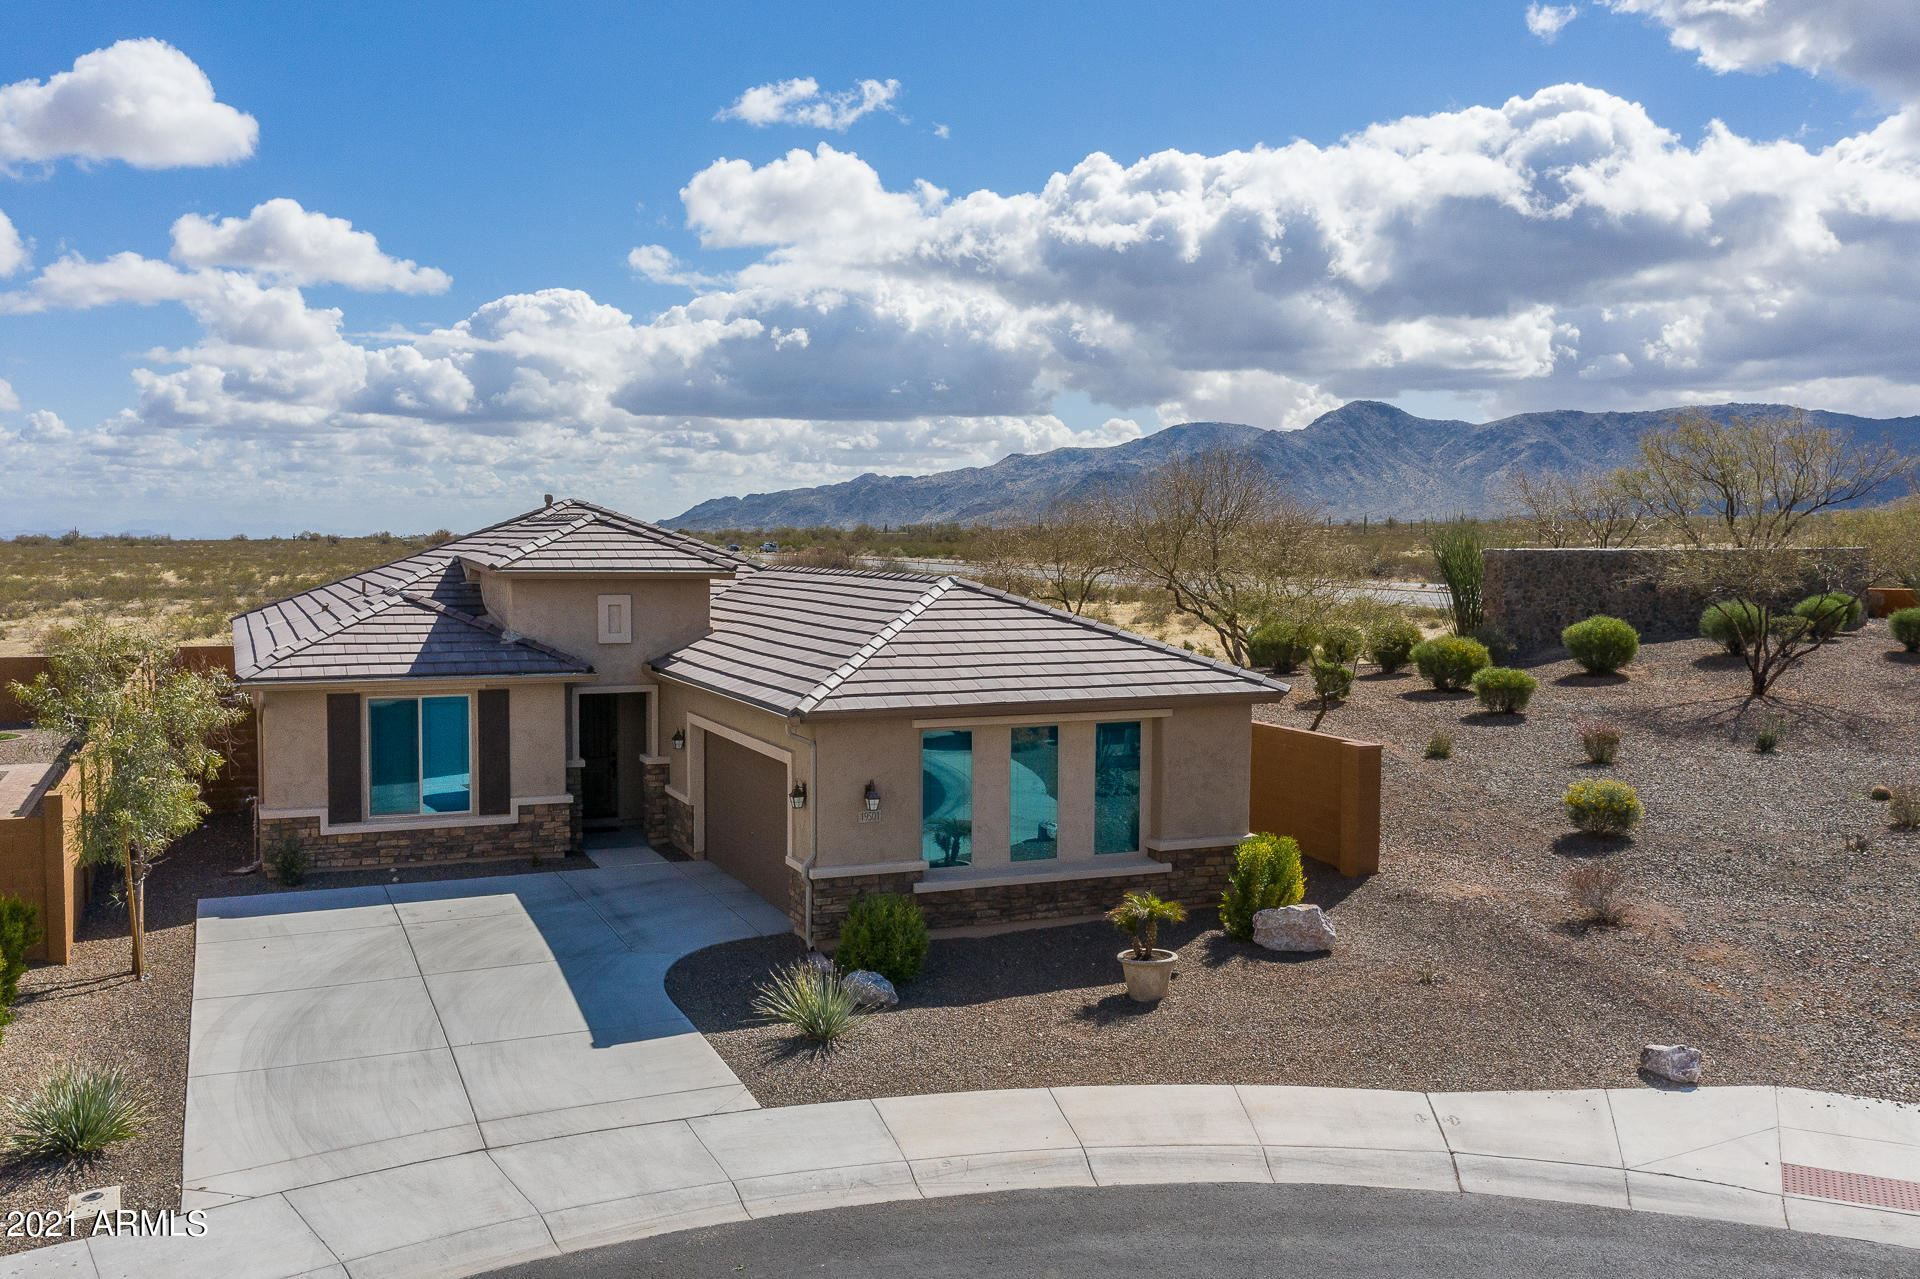 Photo of 19501 N 259TH Avenue, Buckeye, AZ 85396 (MLS # 6203132)